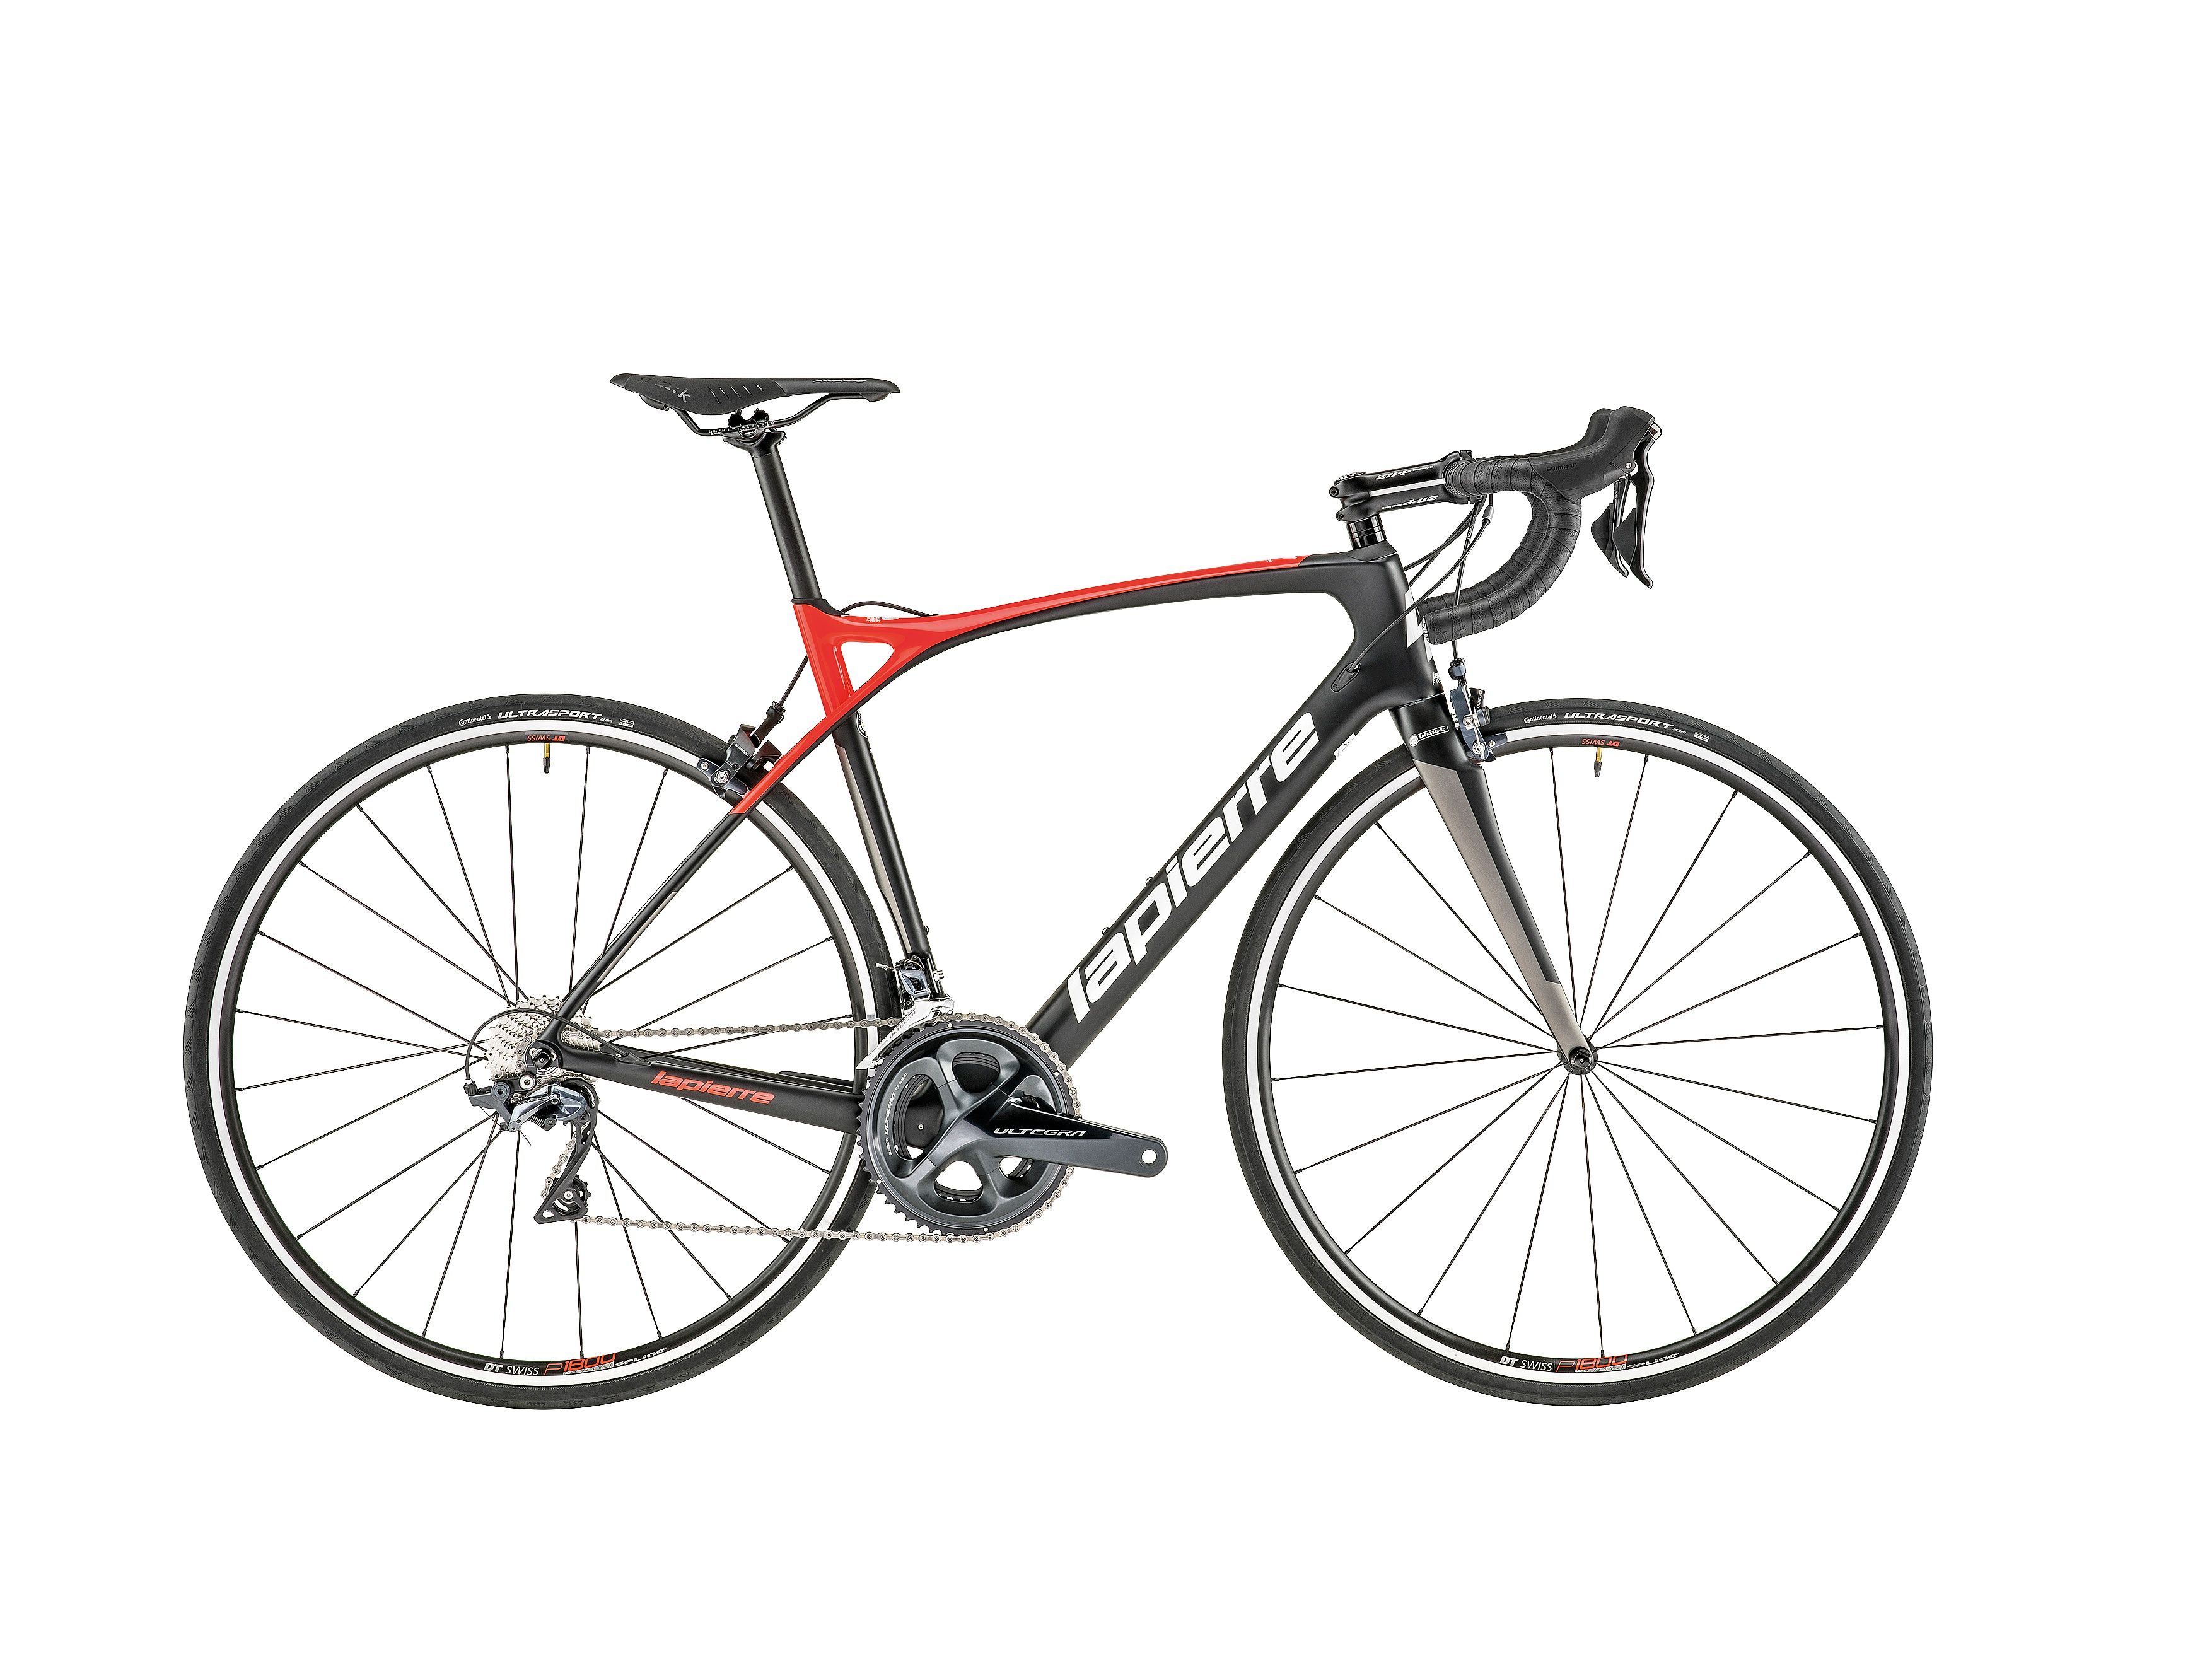 kolo Lapierre Xelius SL2 600 - Black/Red 58/XL (188-195cm)